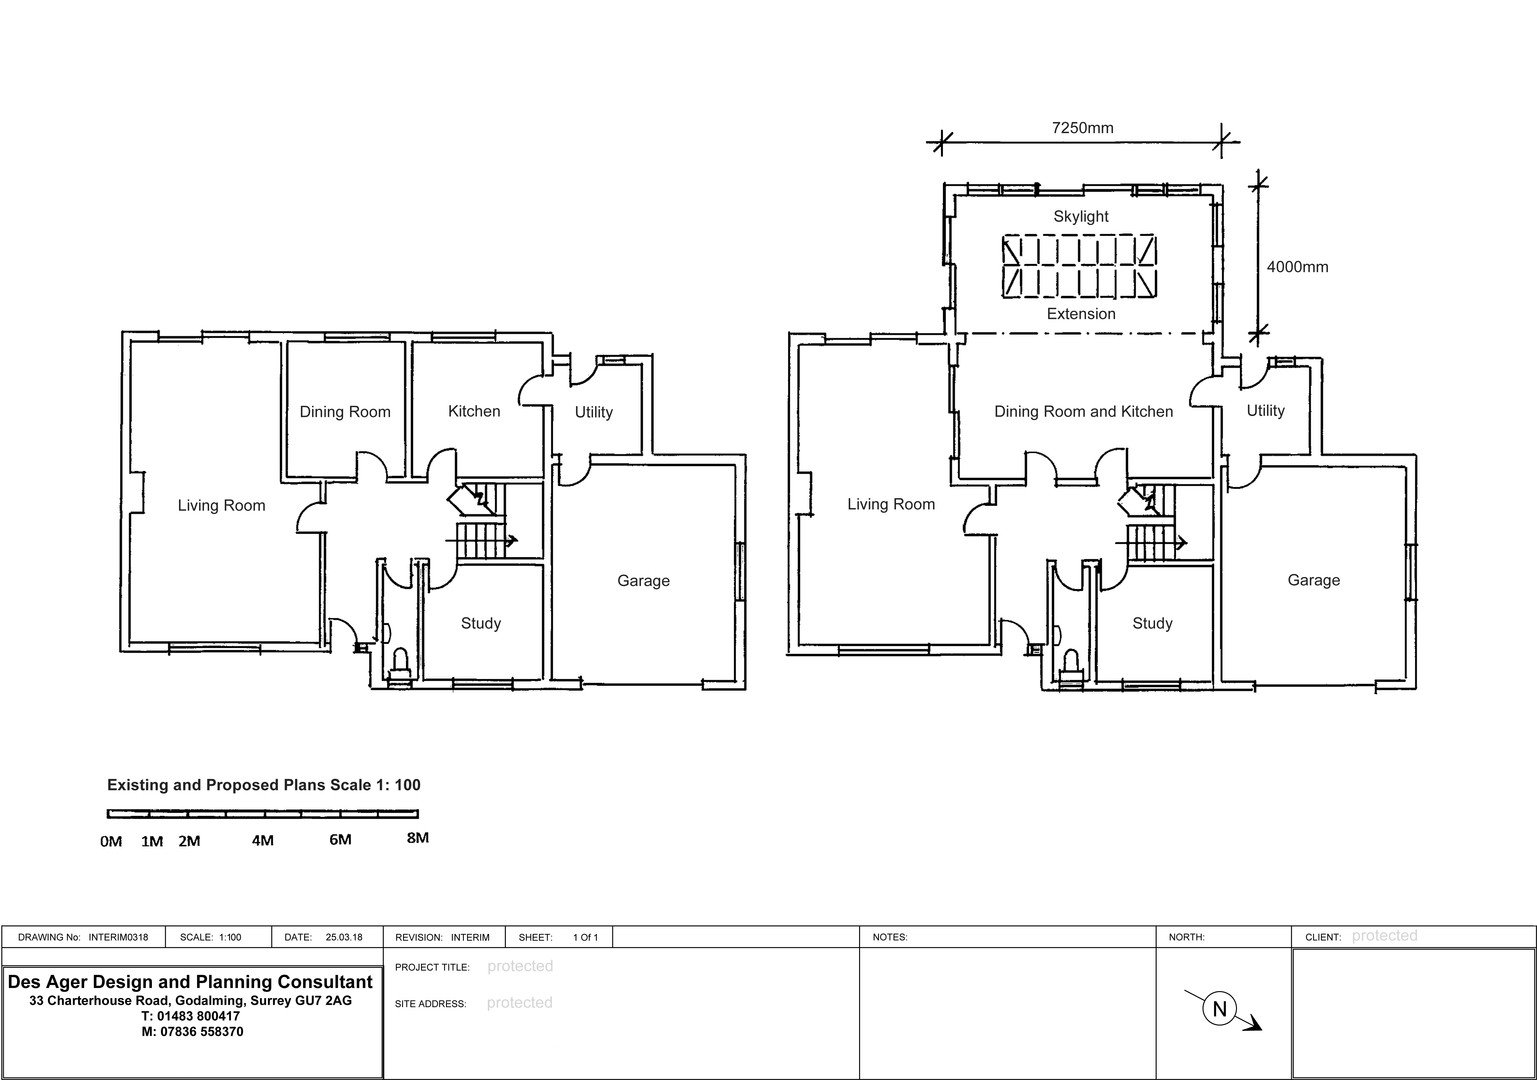 Des_Ager_Design_&_Planning_Consultant_Fr